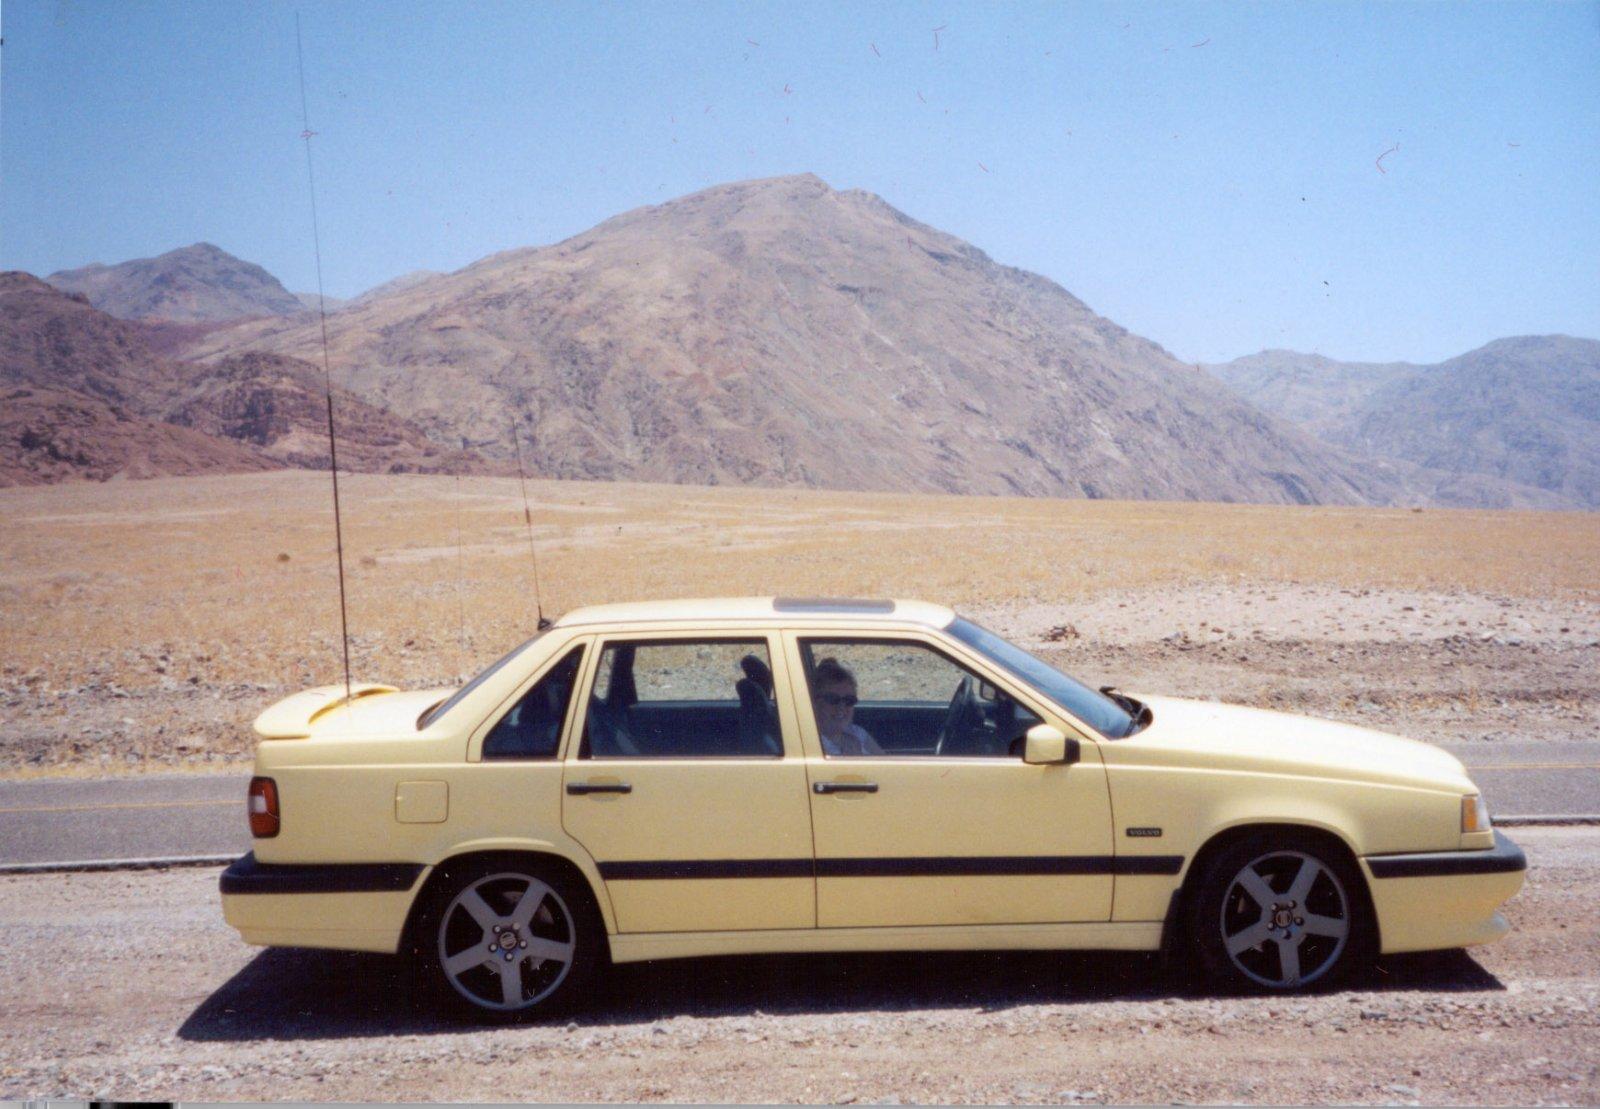 1995_Volvo_850_T5R_At_Death_Valley_2005_06_12.jpg